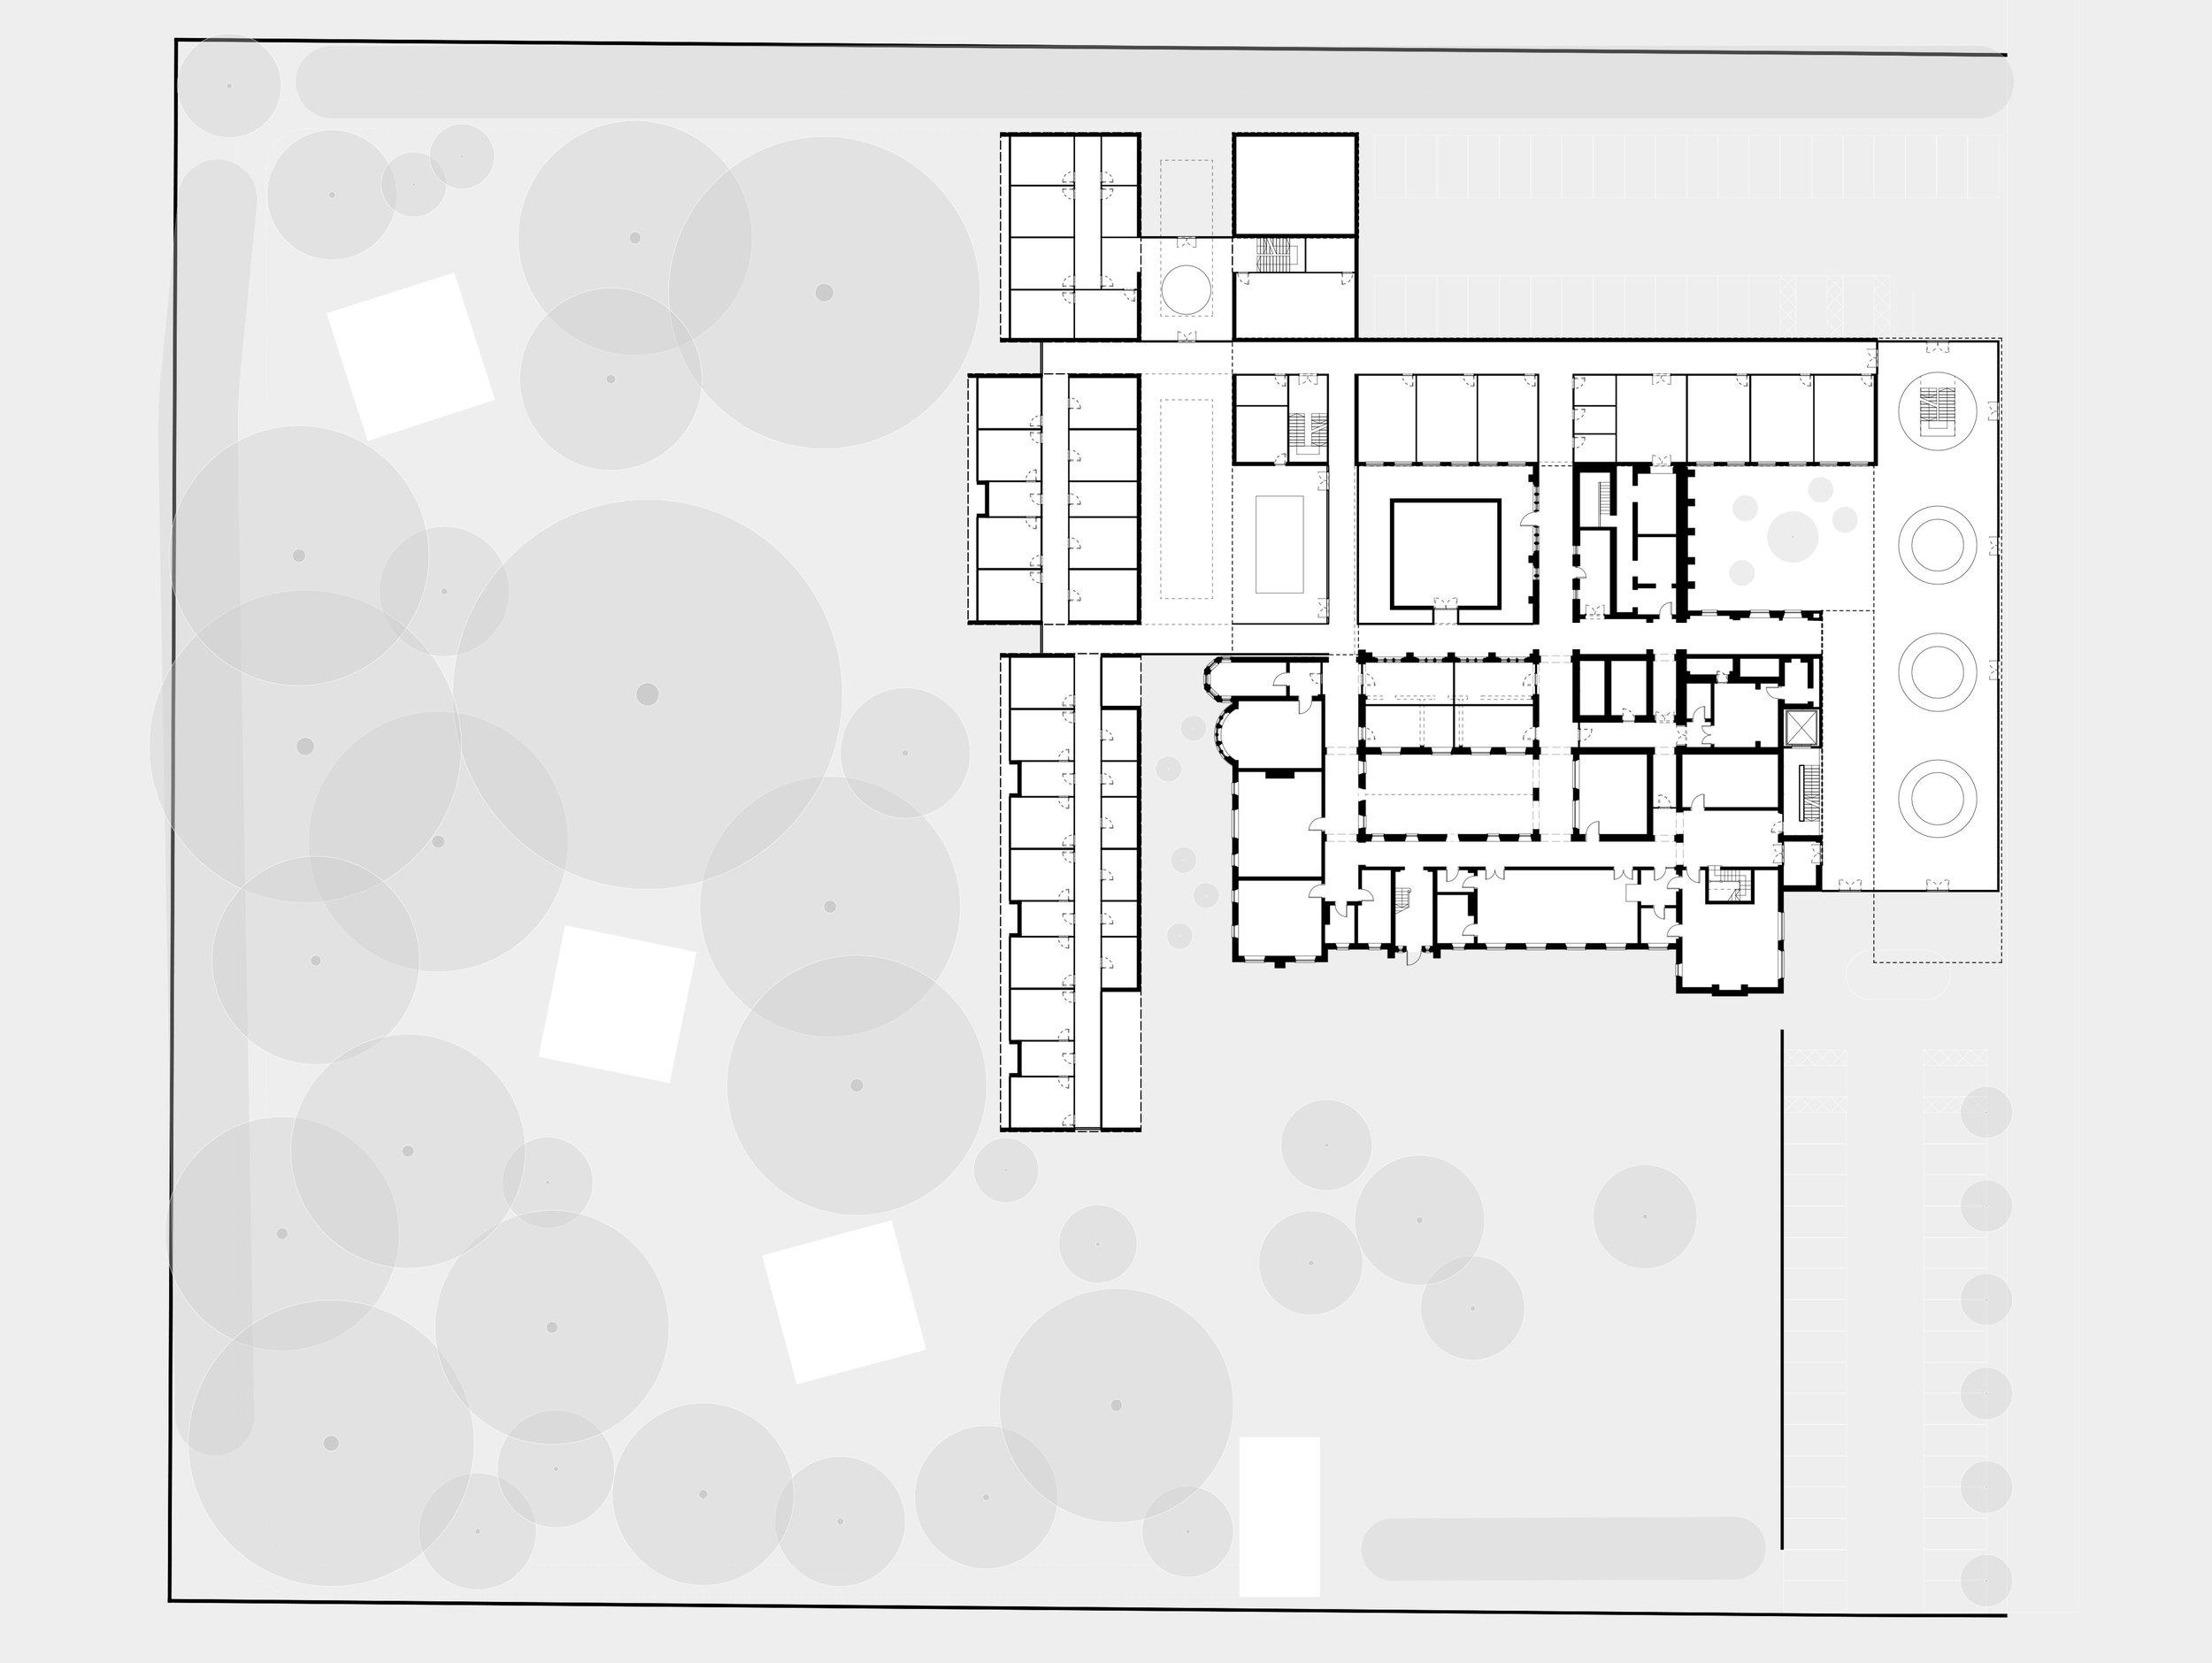 150 - Site Plan.jpg